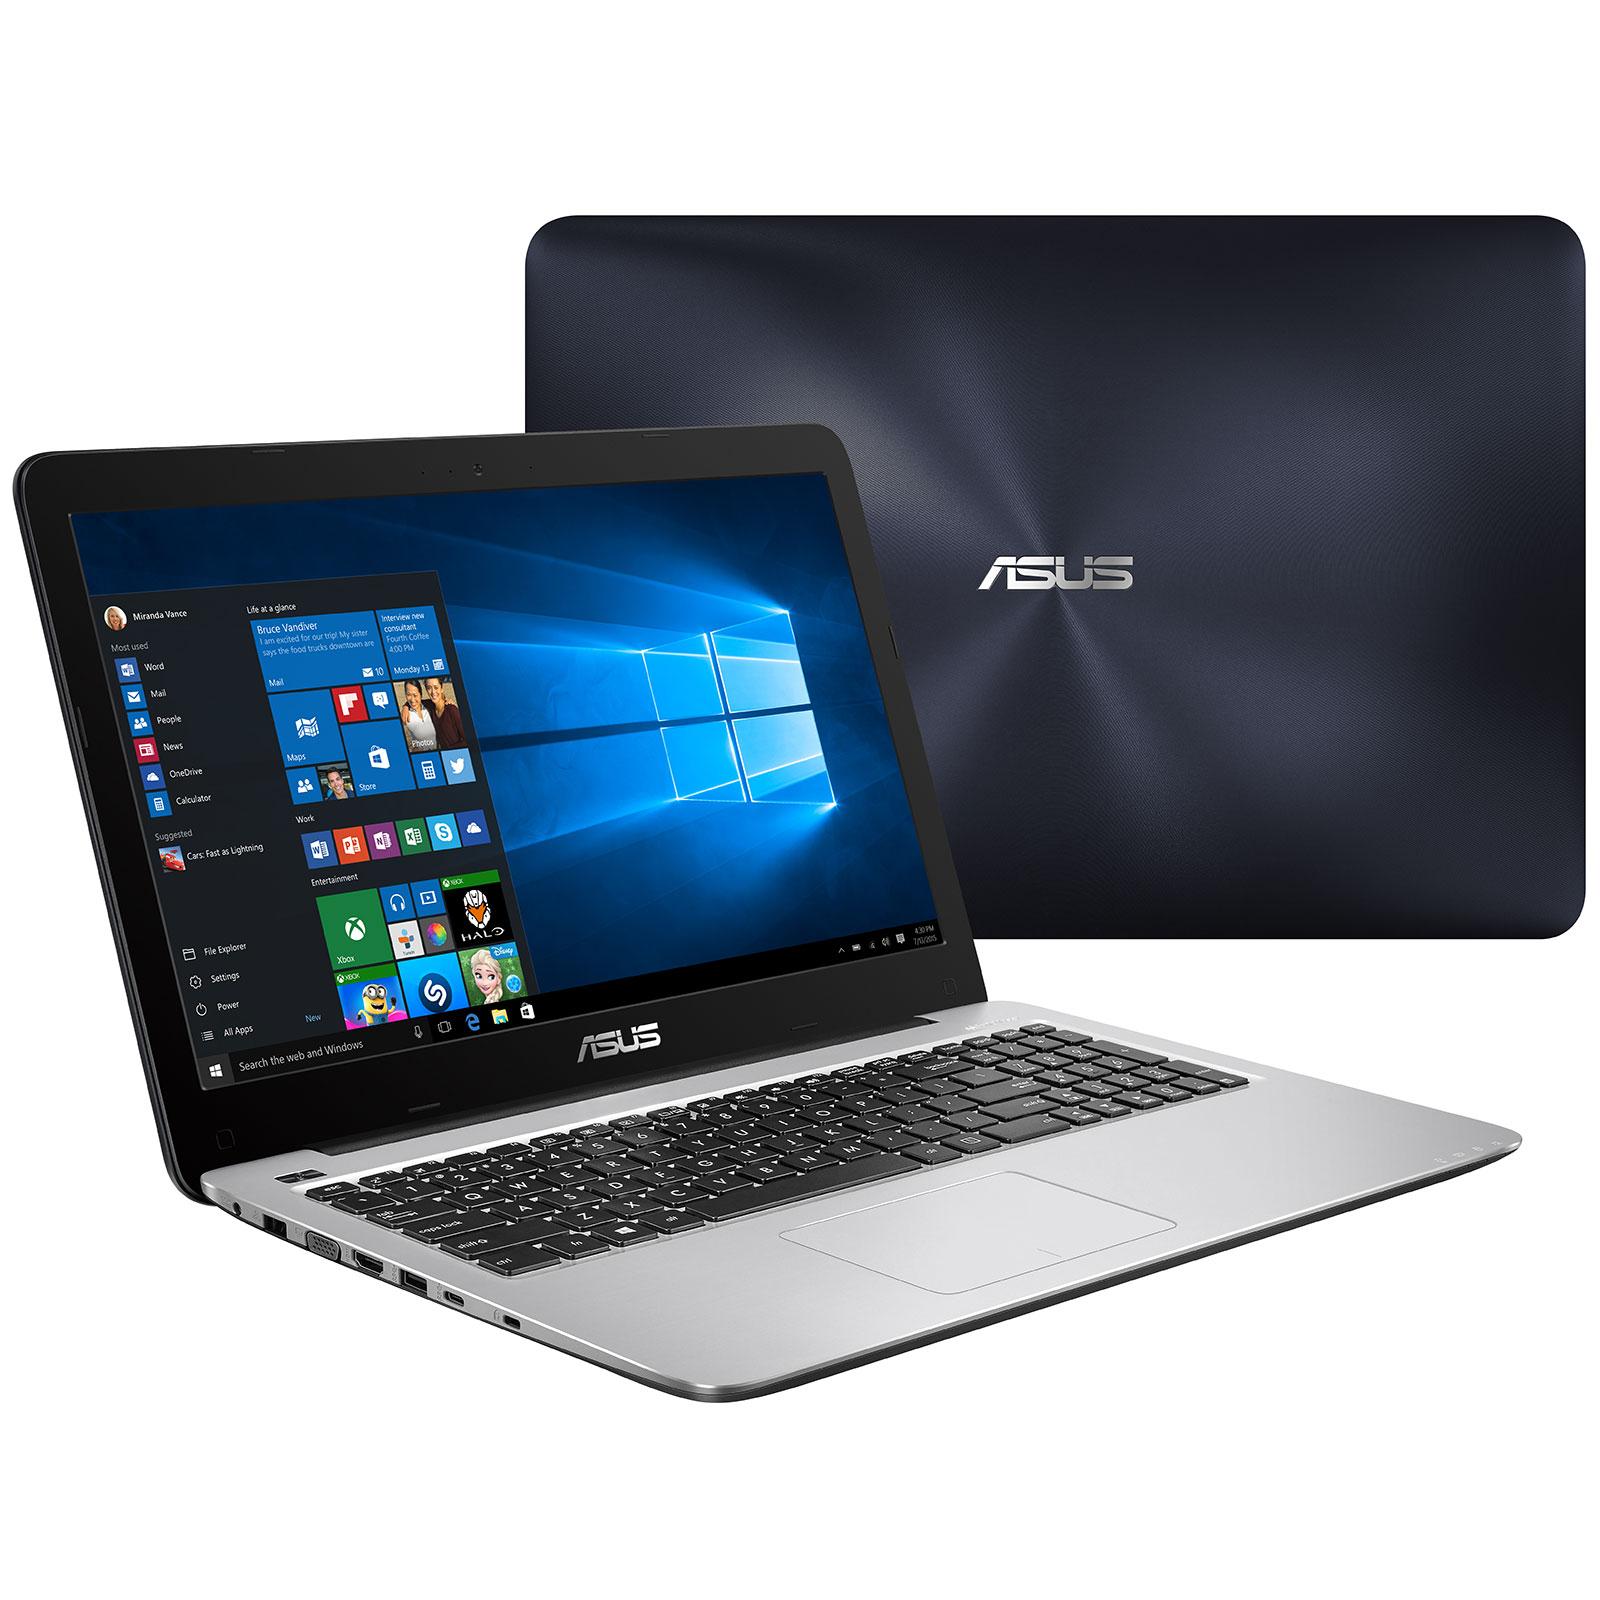 "PC portable ASUS R558UV-DM344T Intel Core i5-6200U 8 Go SSD 128 Go + HDD 500 Go 15.6"" LED Full HD NVIDIA GeForce 920MX Wi-Fi N/Bluetooth Webcam Windows 10 Famille 64 bits (garantie constructeur 2 ans)"